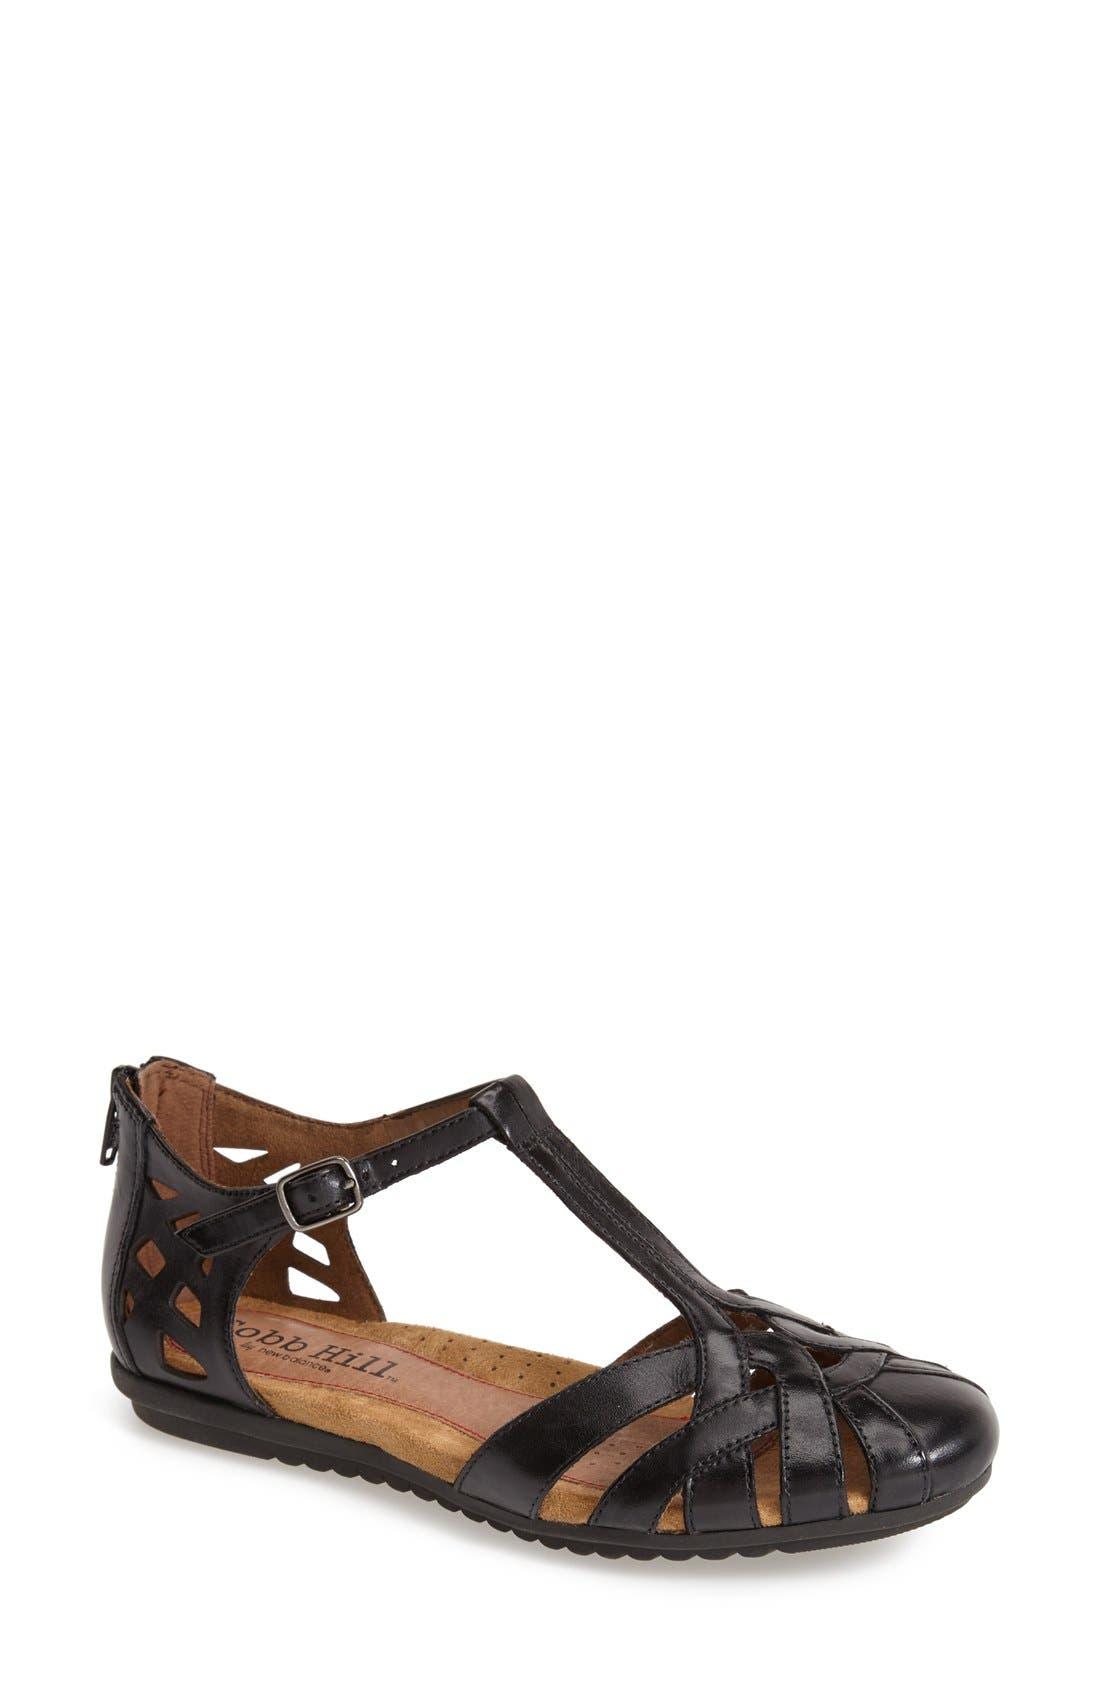 ROCKPORT COBB HILL, 'Ireland' Leather Sandal, Main thumbnail 1, color, BLACK